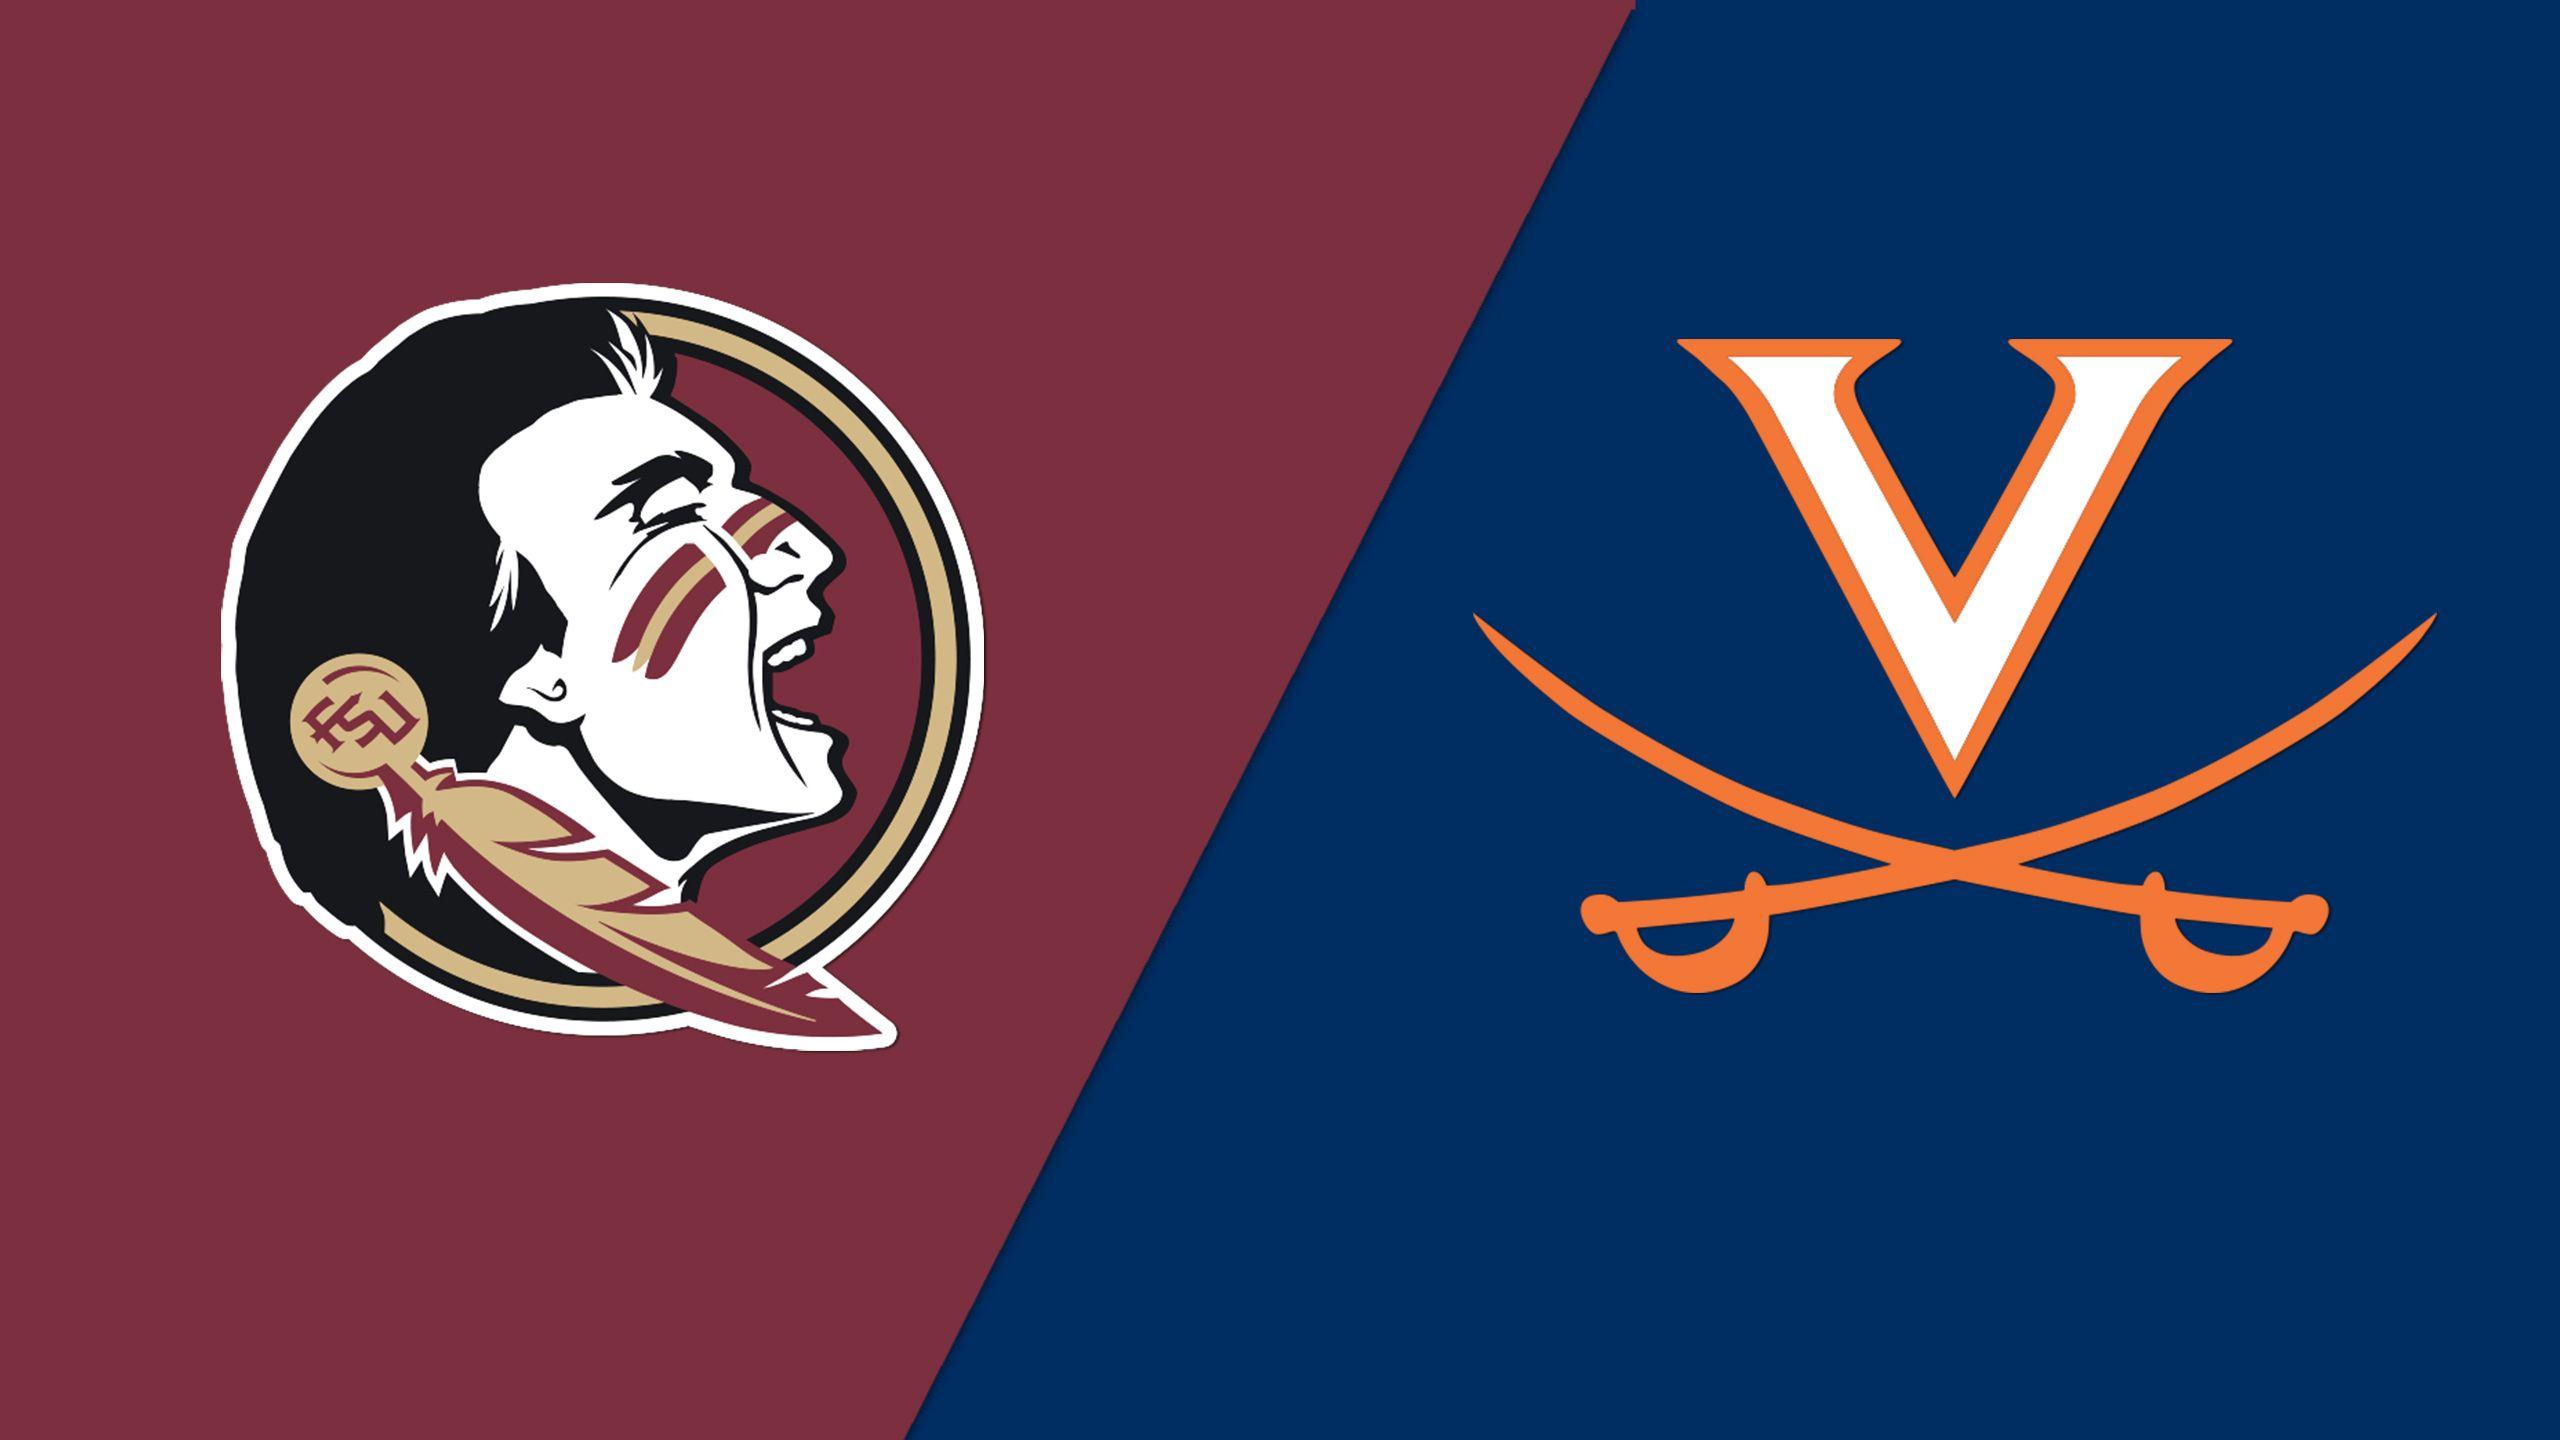 #9 Florida State vs. #4 Virginia (M Basketball)